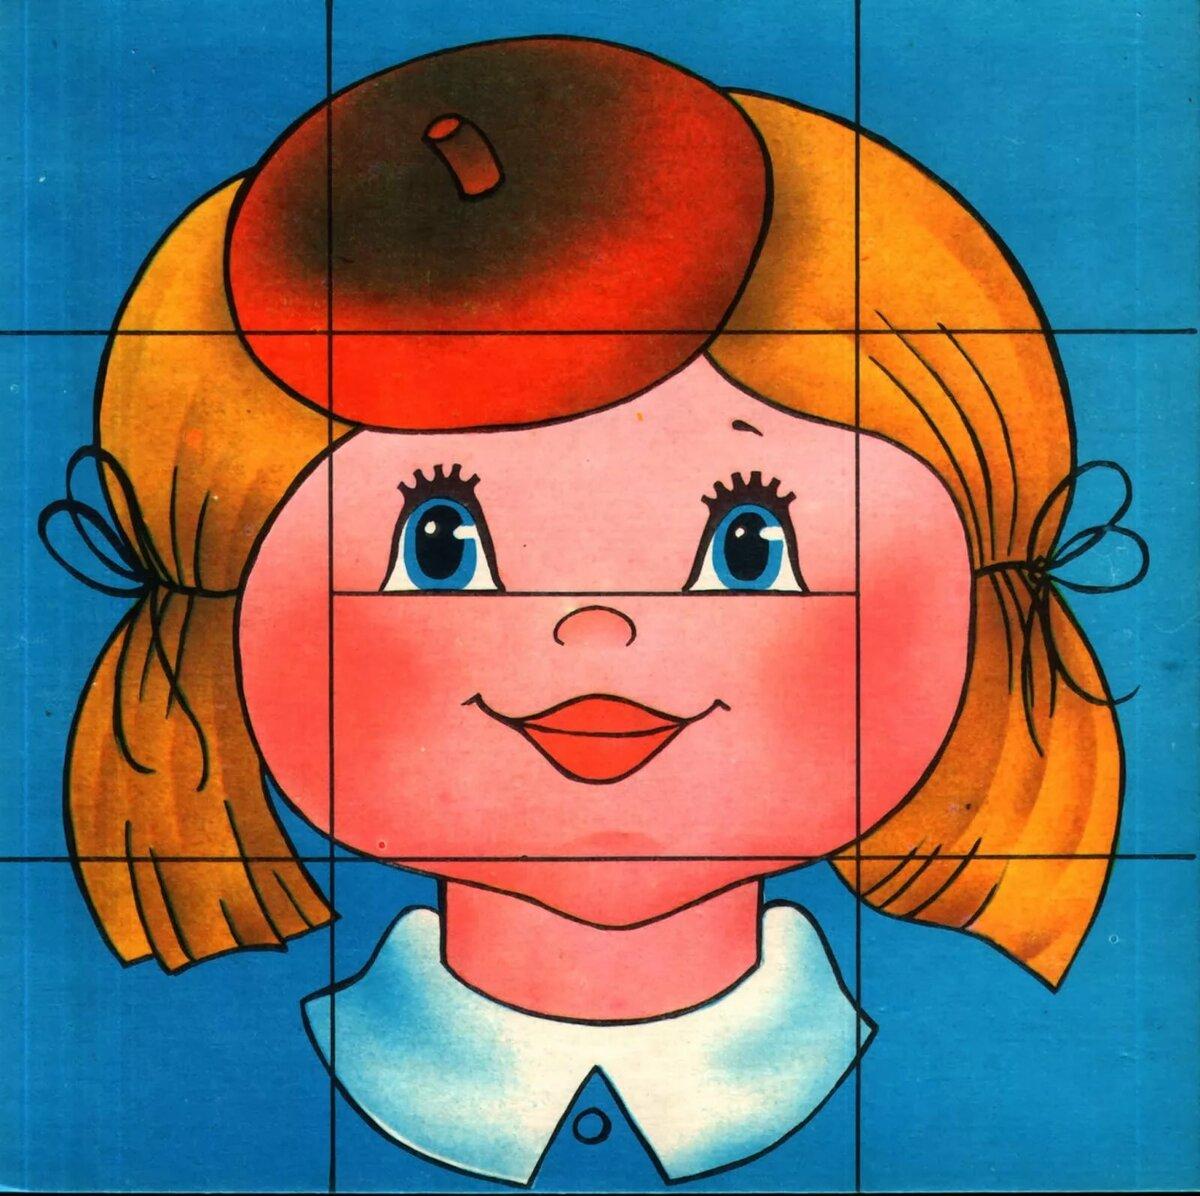 картинки разрезные куклы фарфора скрытым намеком